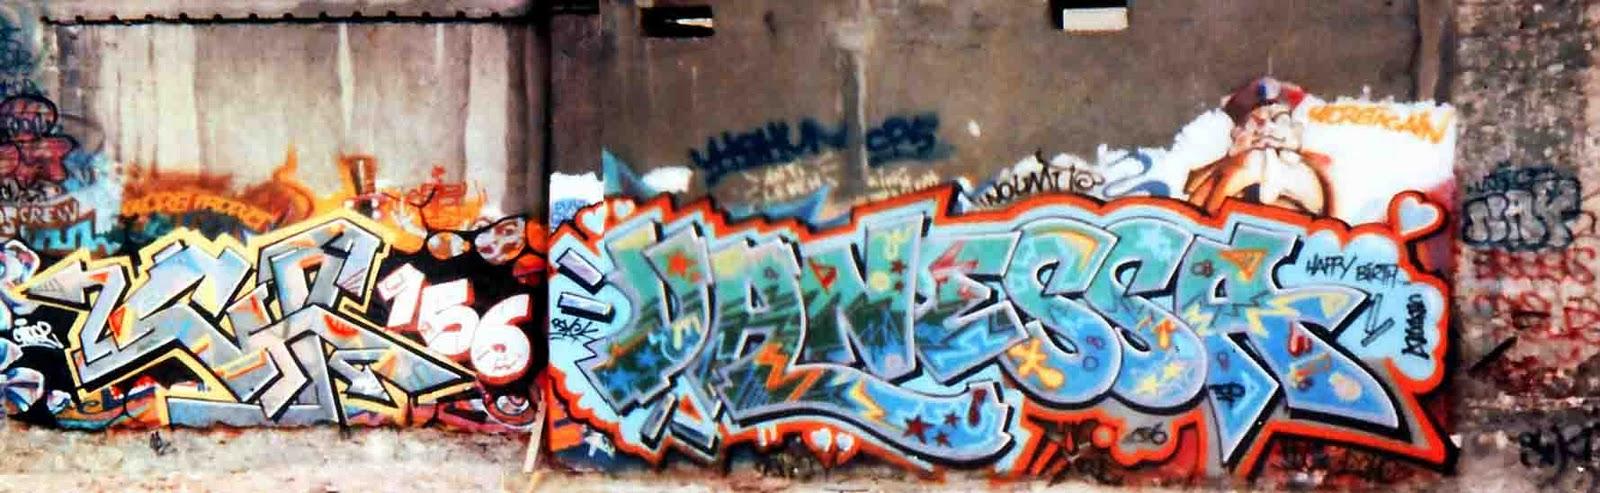 054-graffiti-girljpg